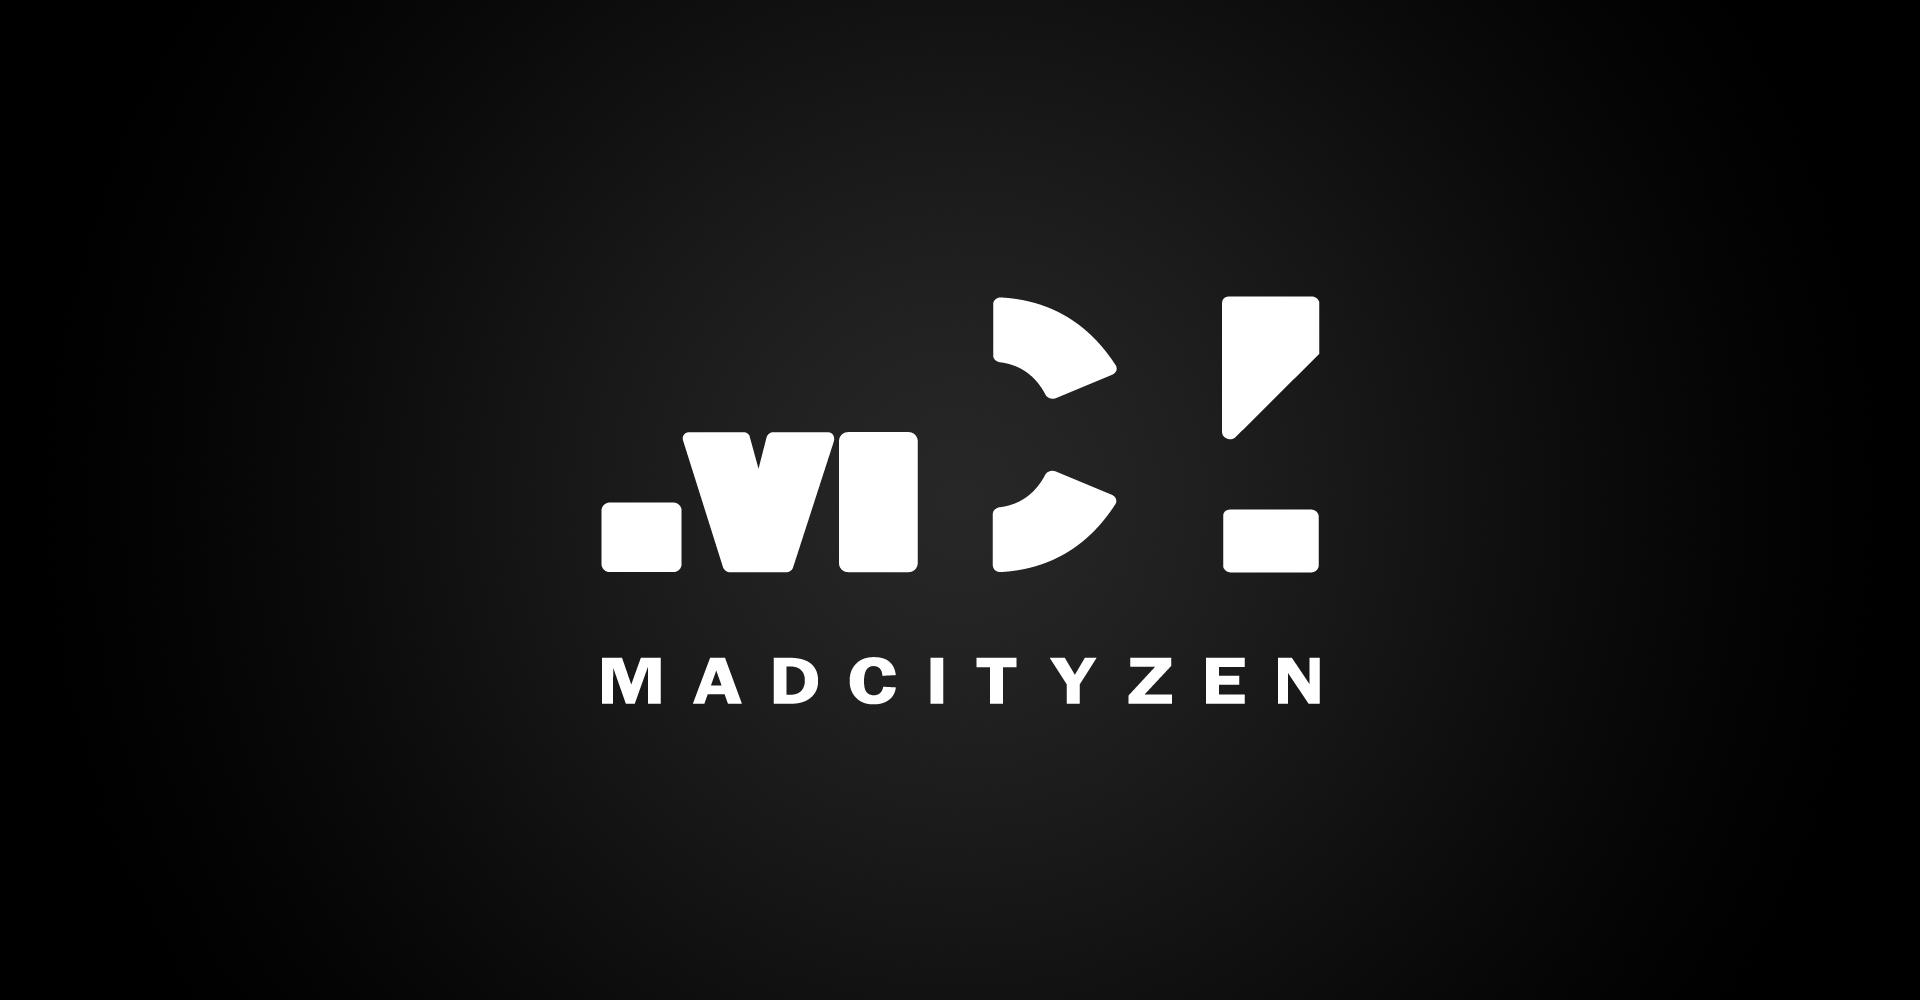 Logo Mad City Zen